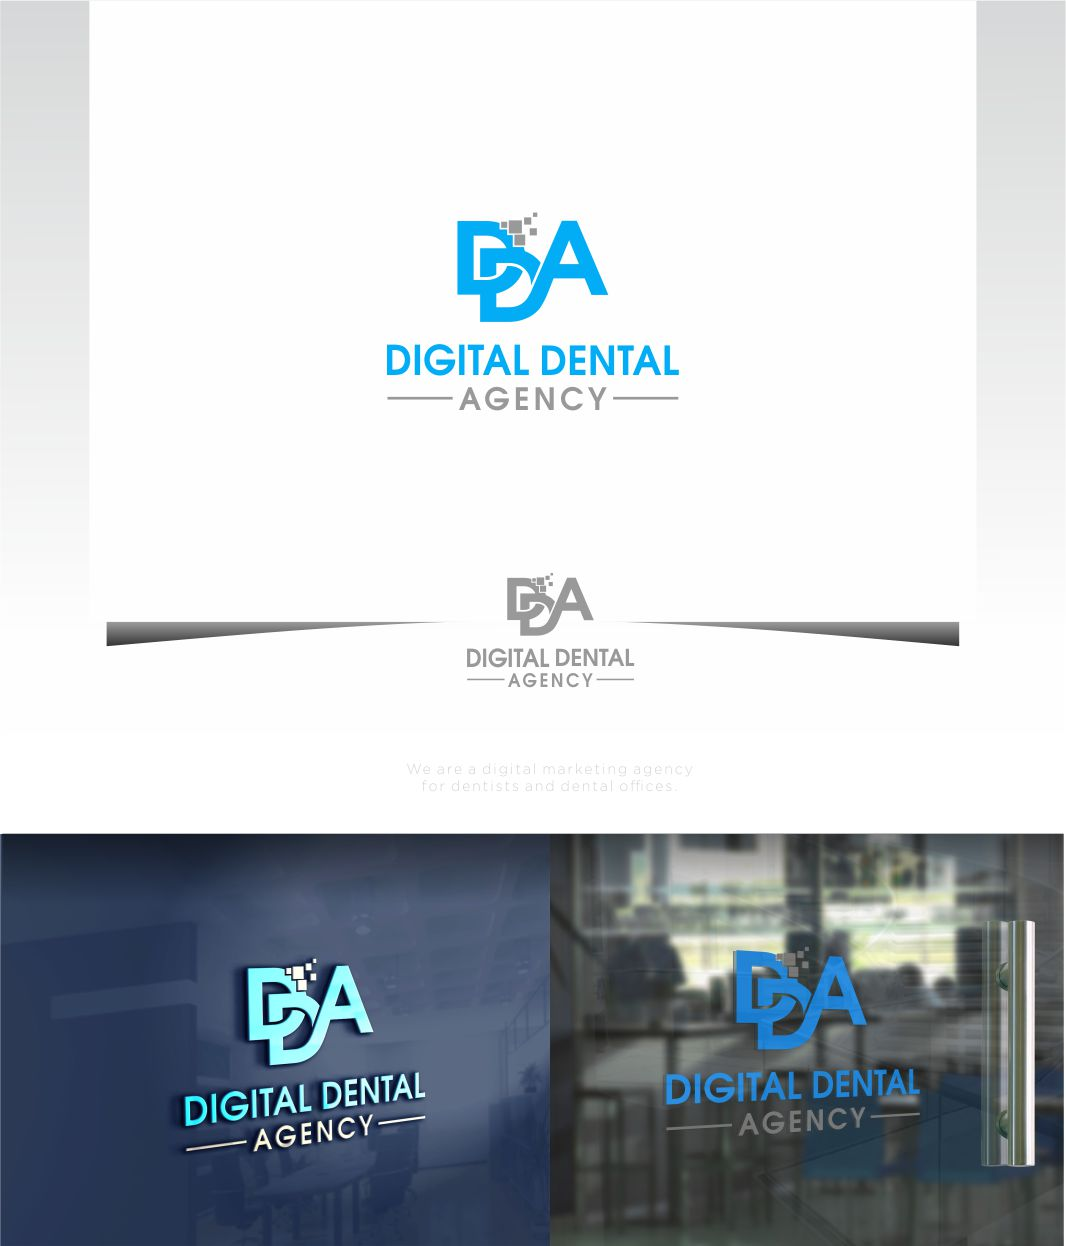 Logo Design by Raymond Garcia - Entry No. 110 in the Logo Design Contest Imaginative Logo Design for Digital Dental Agency.